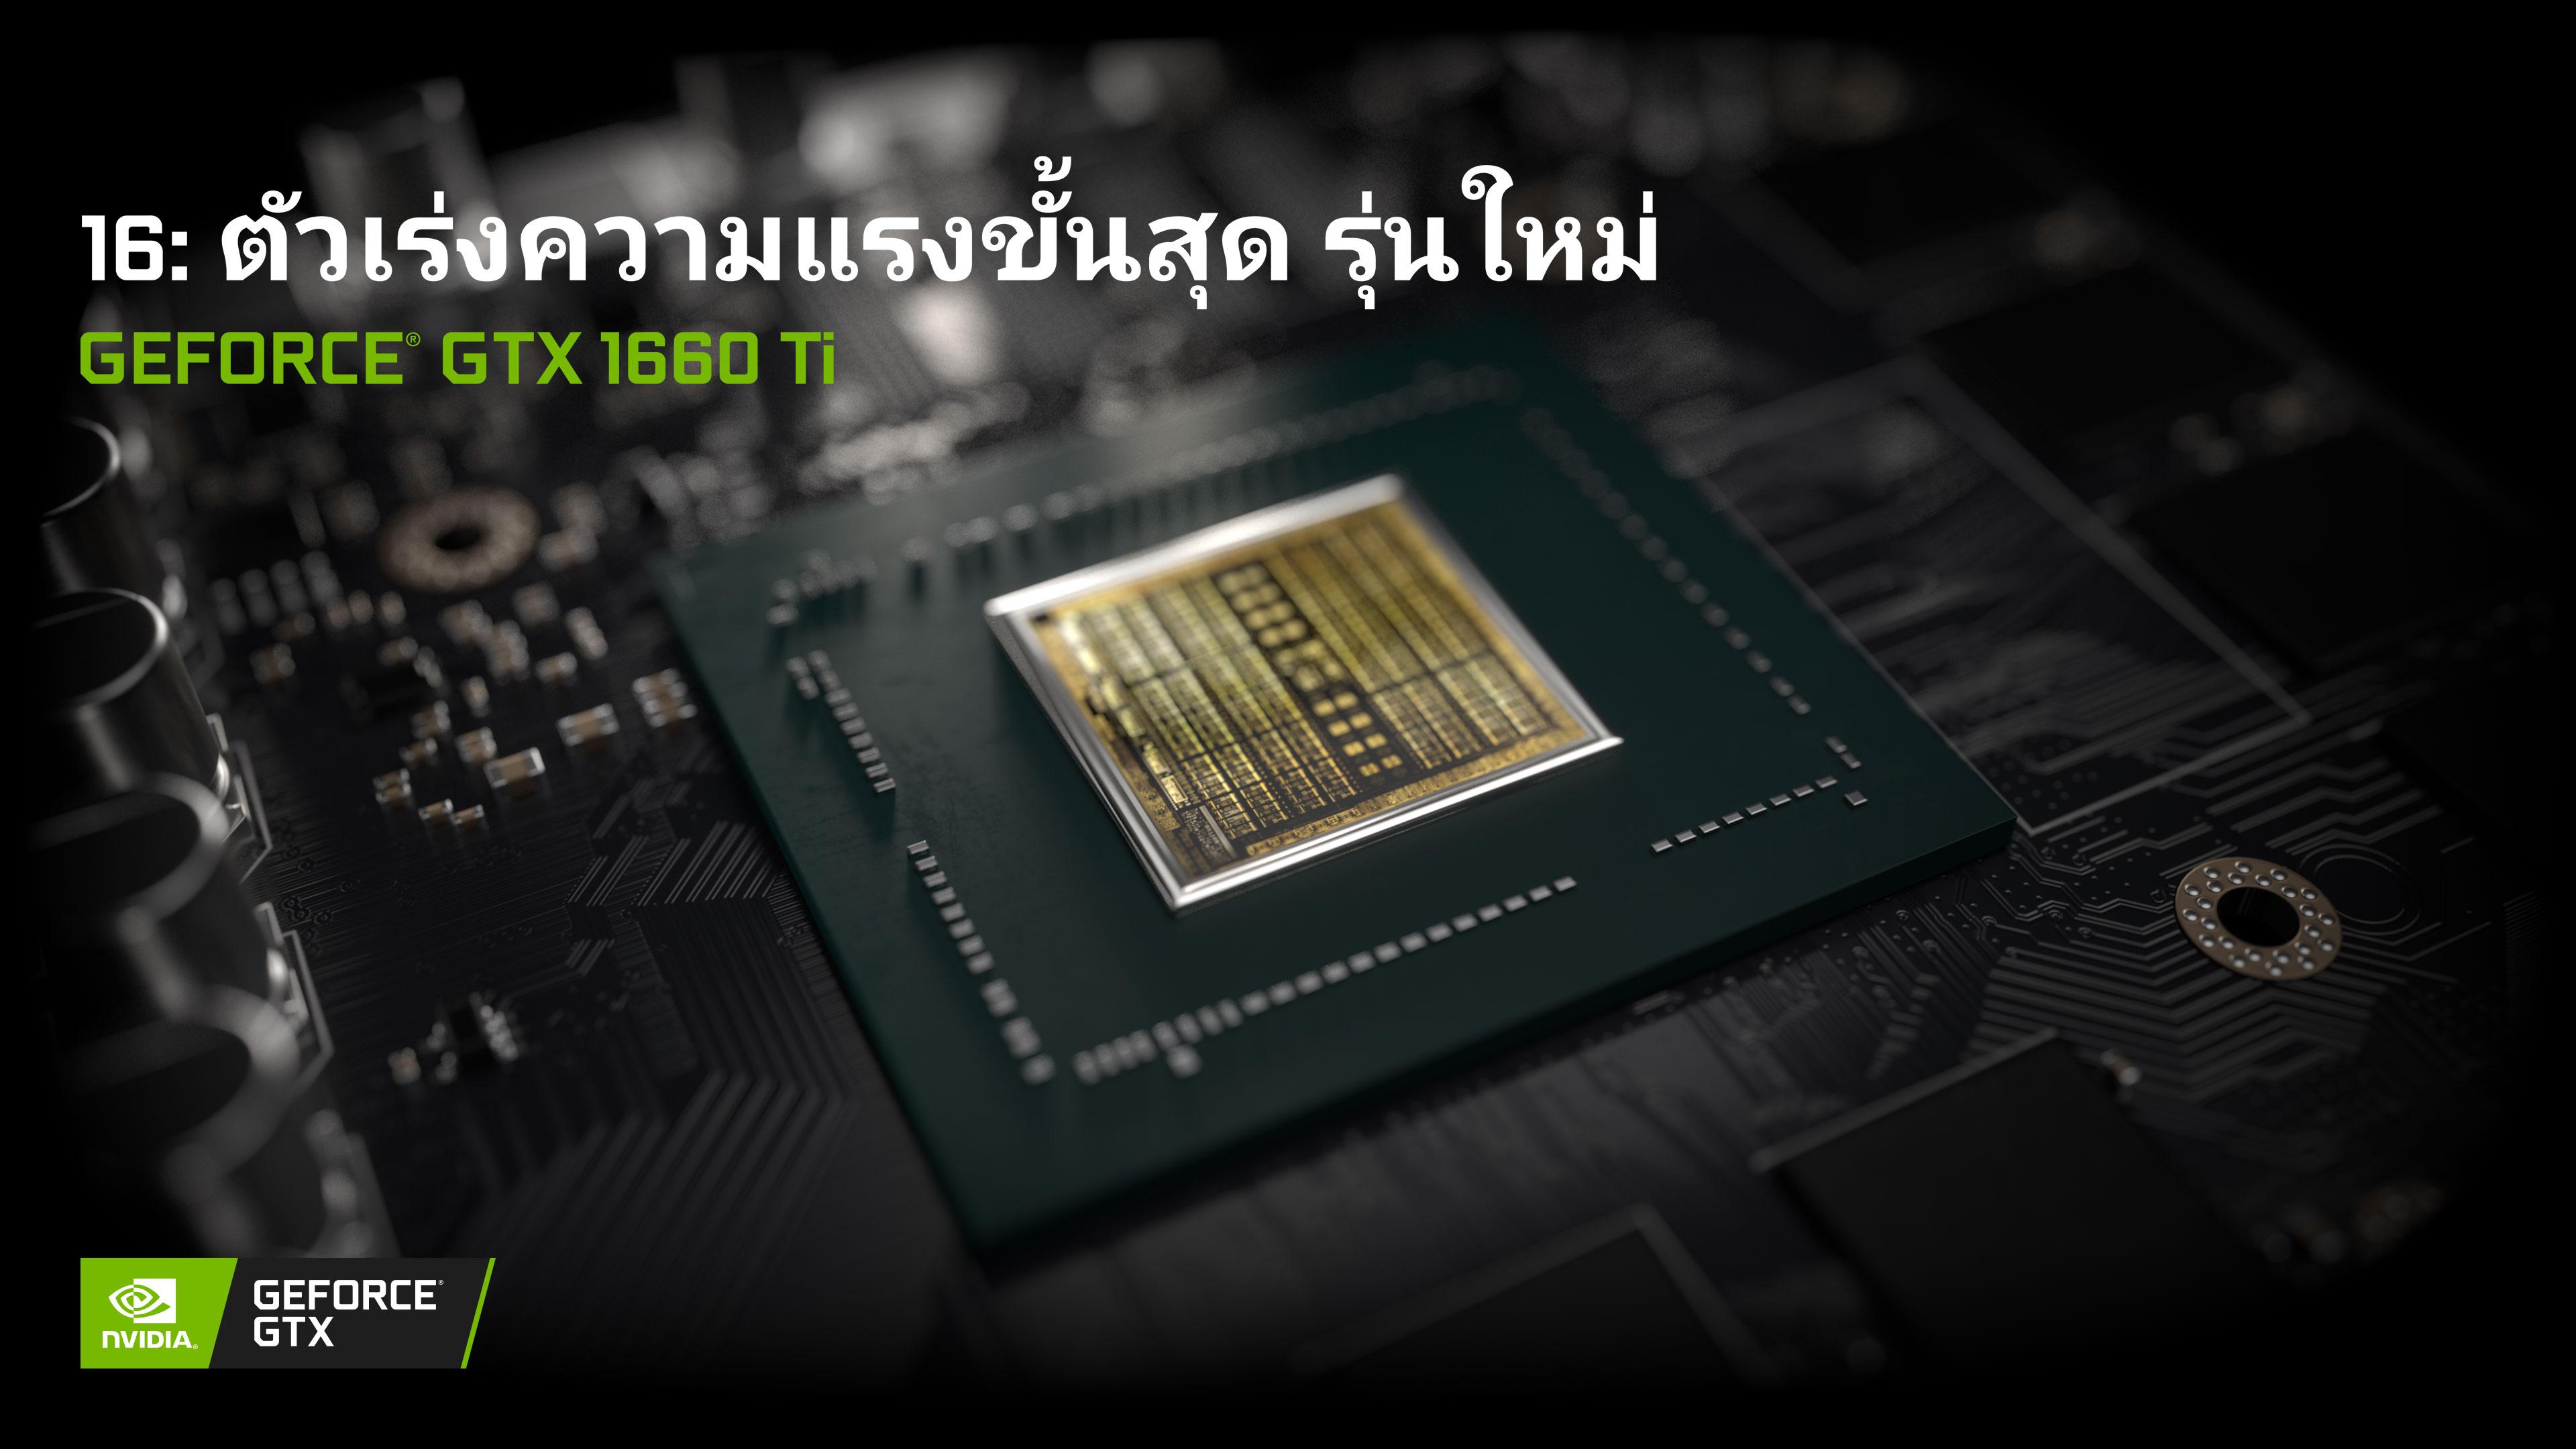 geforce gtx 1660 ti kv final th Nvidia เปิดตัวพร้อมวางจำหน่าย Nvidia GeForce GTX 1660 Ti อย่างเป็นทางการที่ร้านค้าชั้นนำทั่วไทย